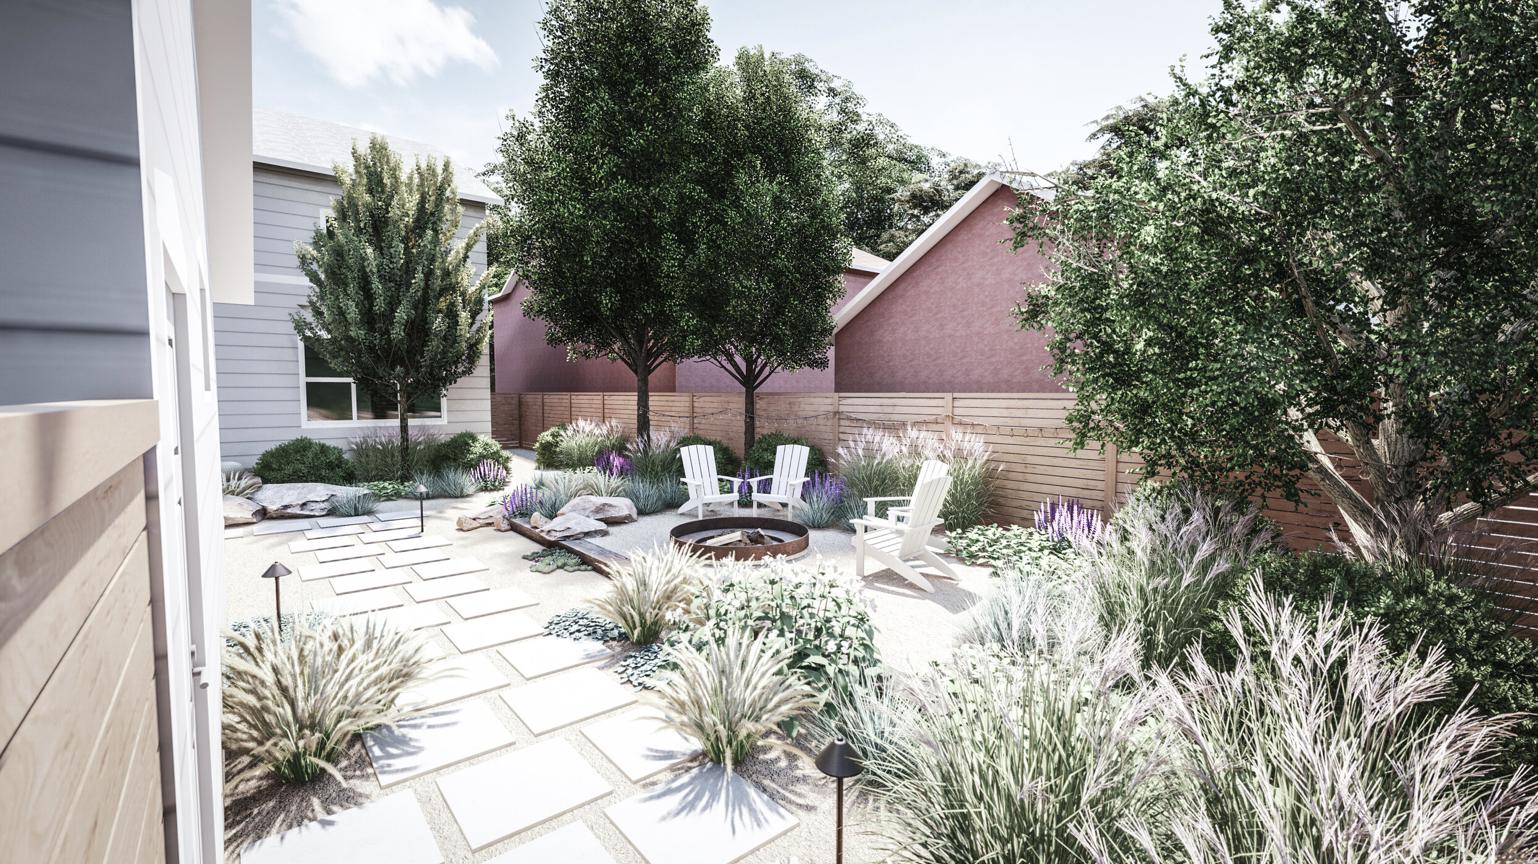 Backyard Design In Denver Colorado In 2021 Yard Design Online Landscape Design Landscape Design